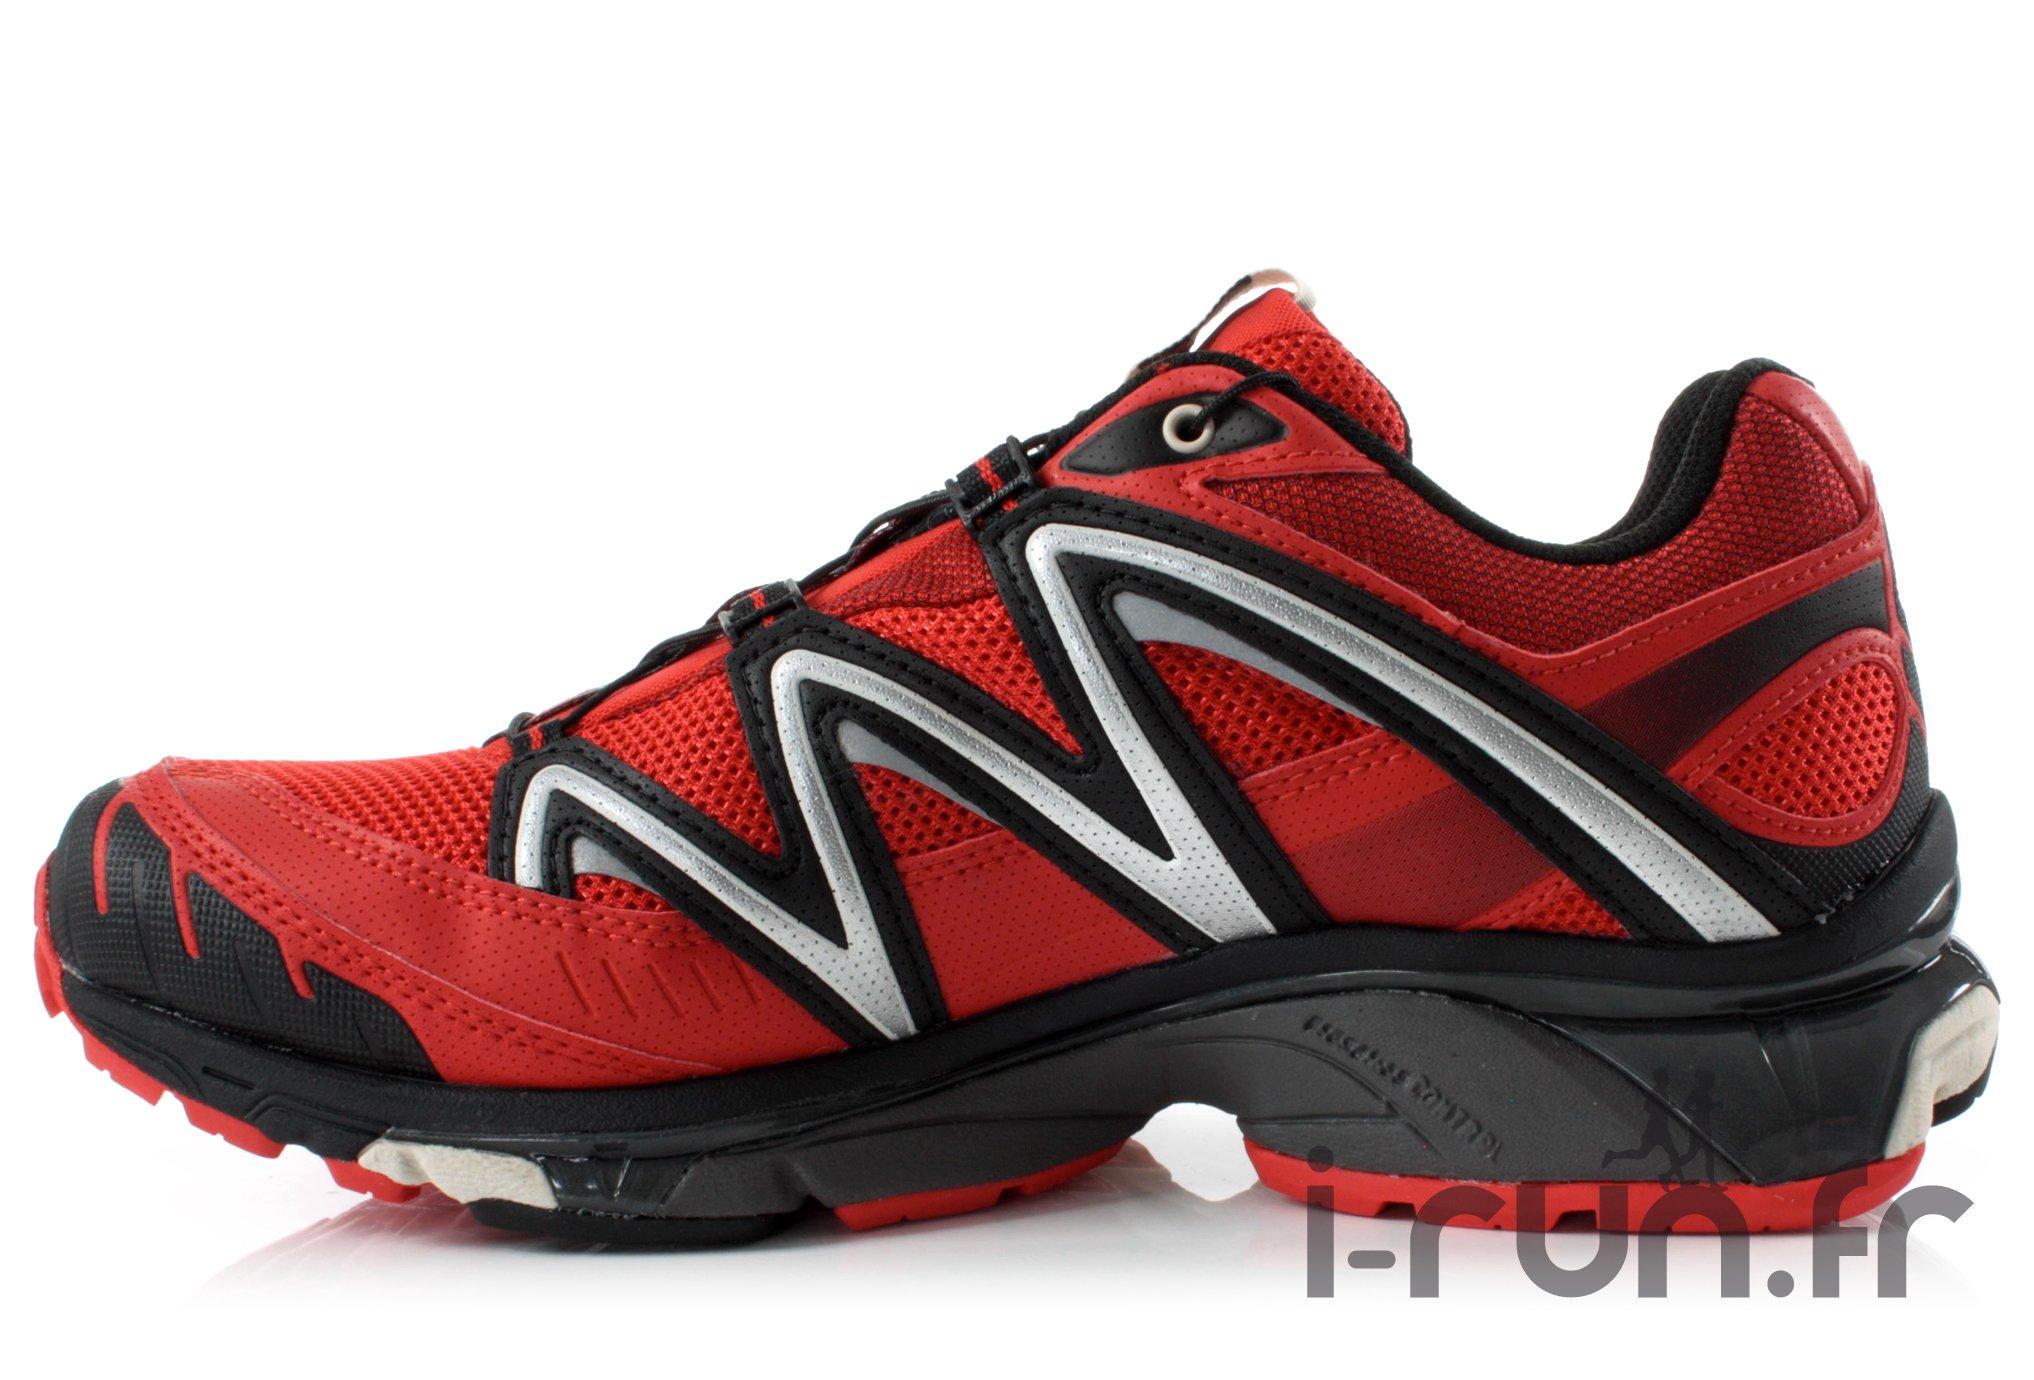 salomon chaussures de trail running xt pulse homme. Black Bedroom Furniture Sets. Home Design Ideas